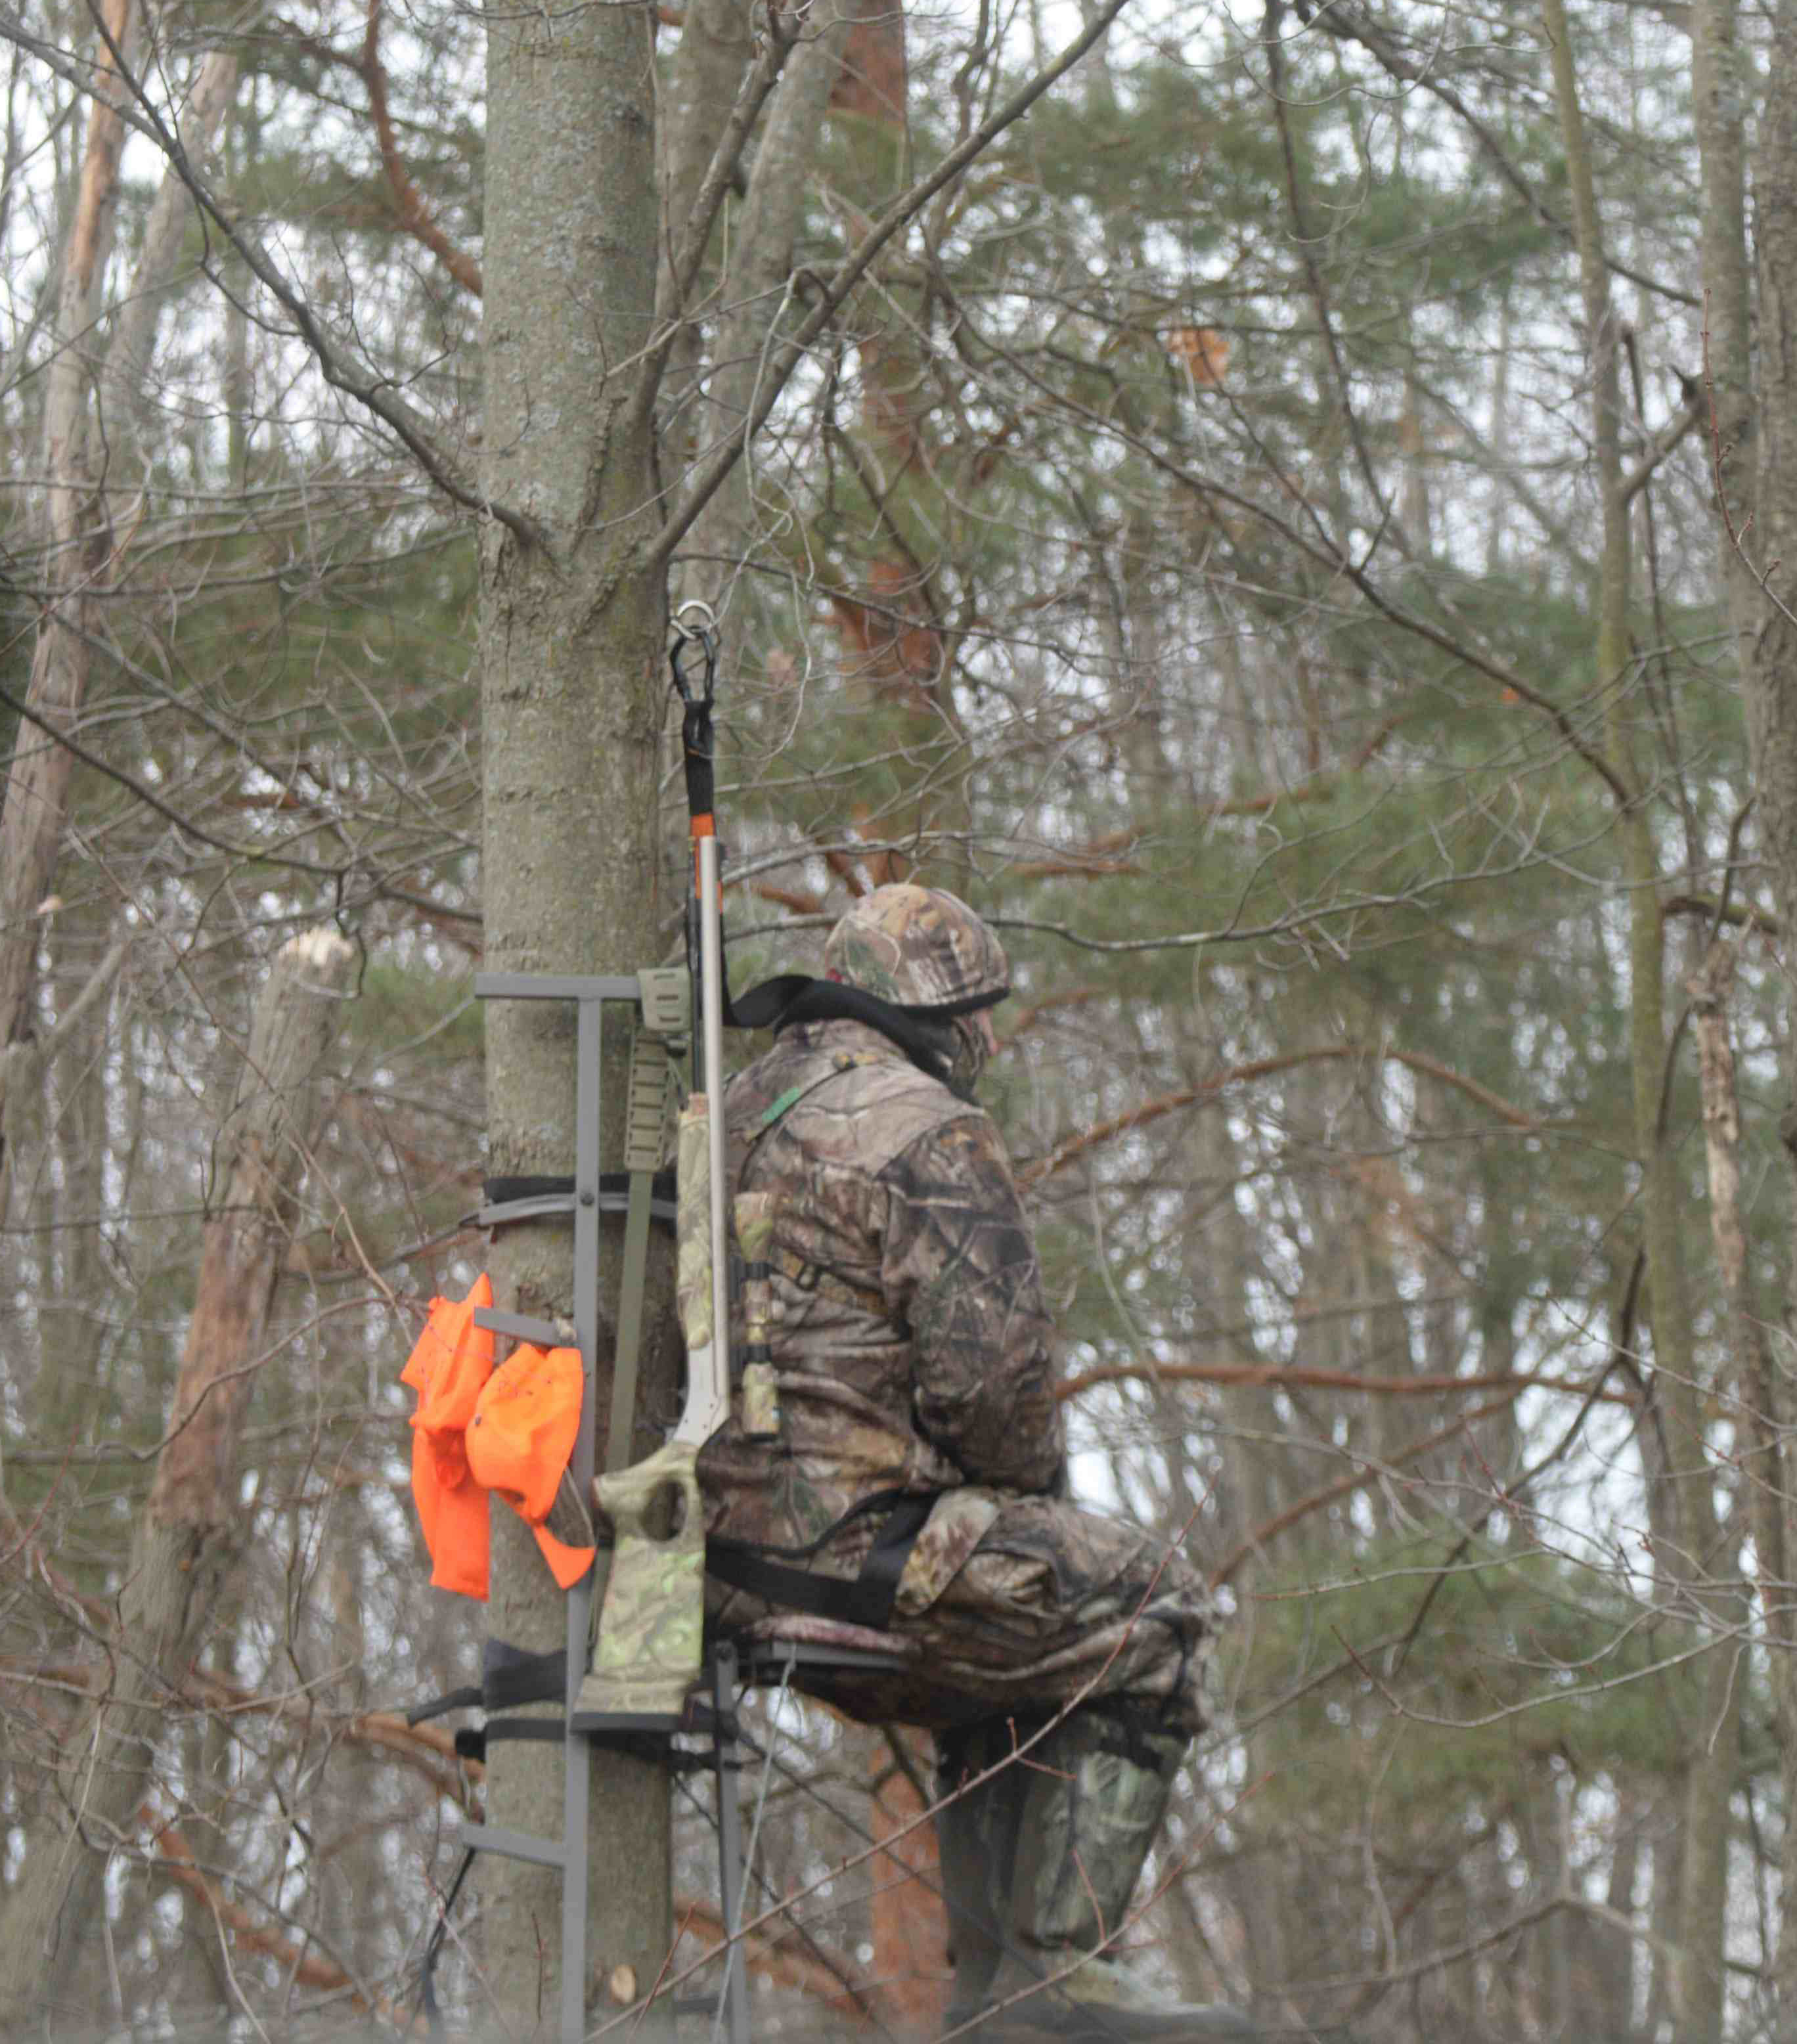 Tree Stand Regulations Hunter In Tree